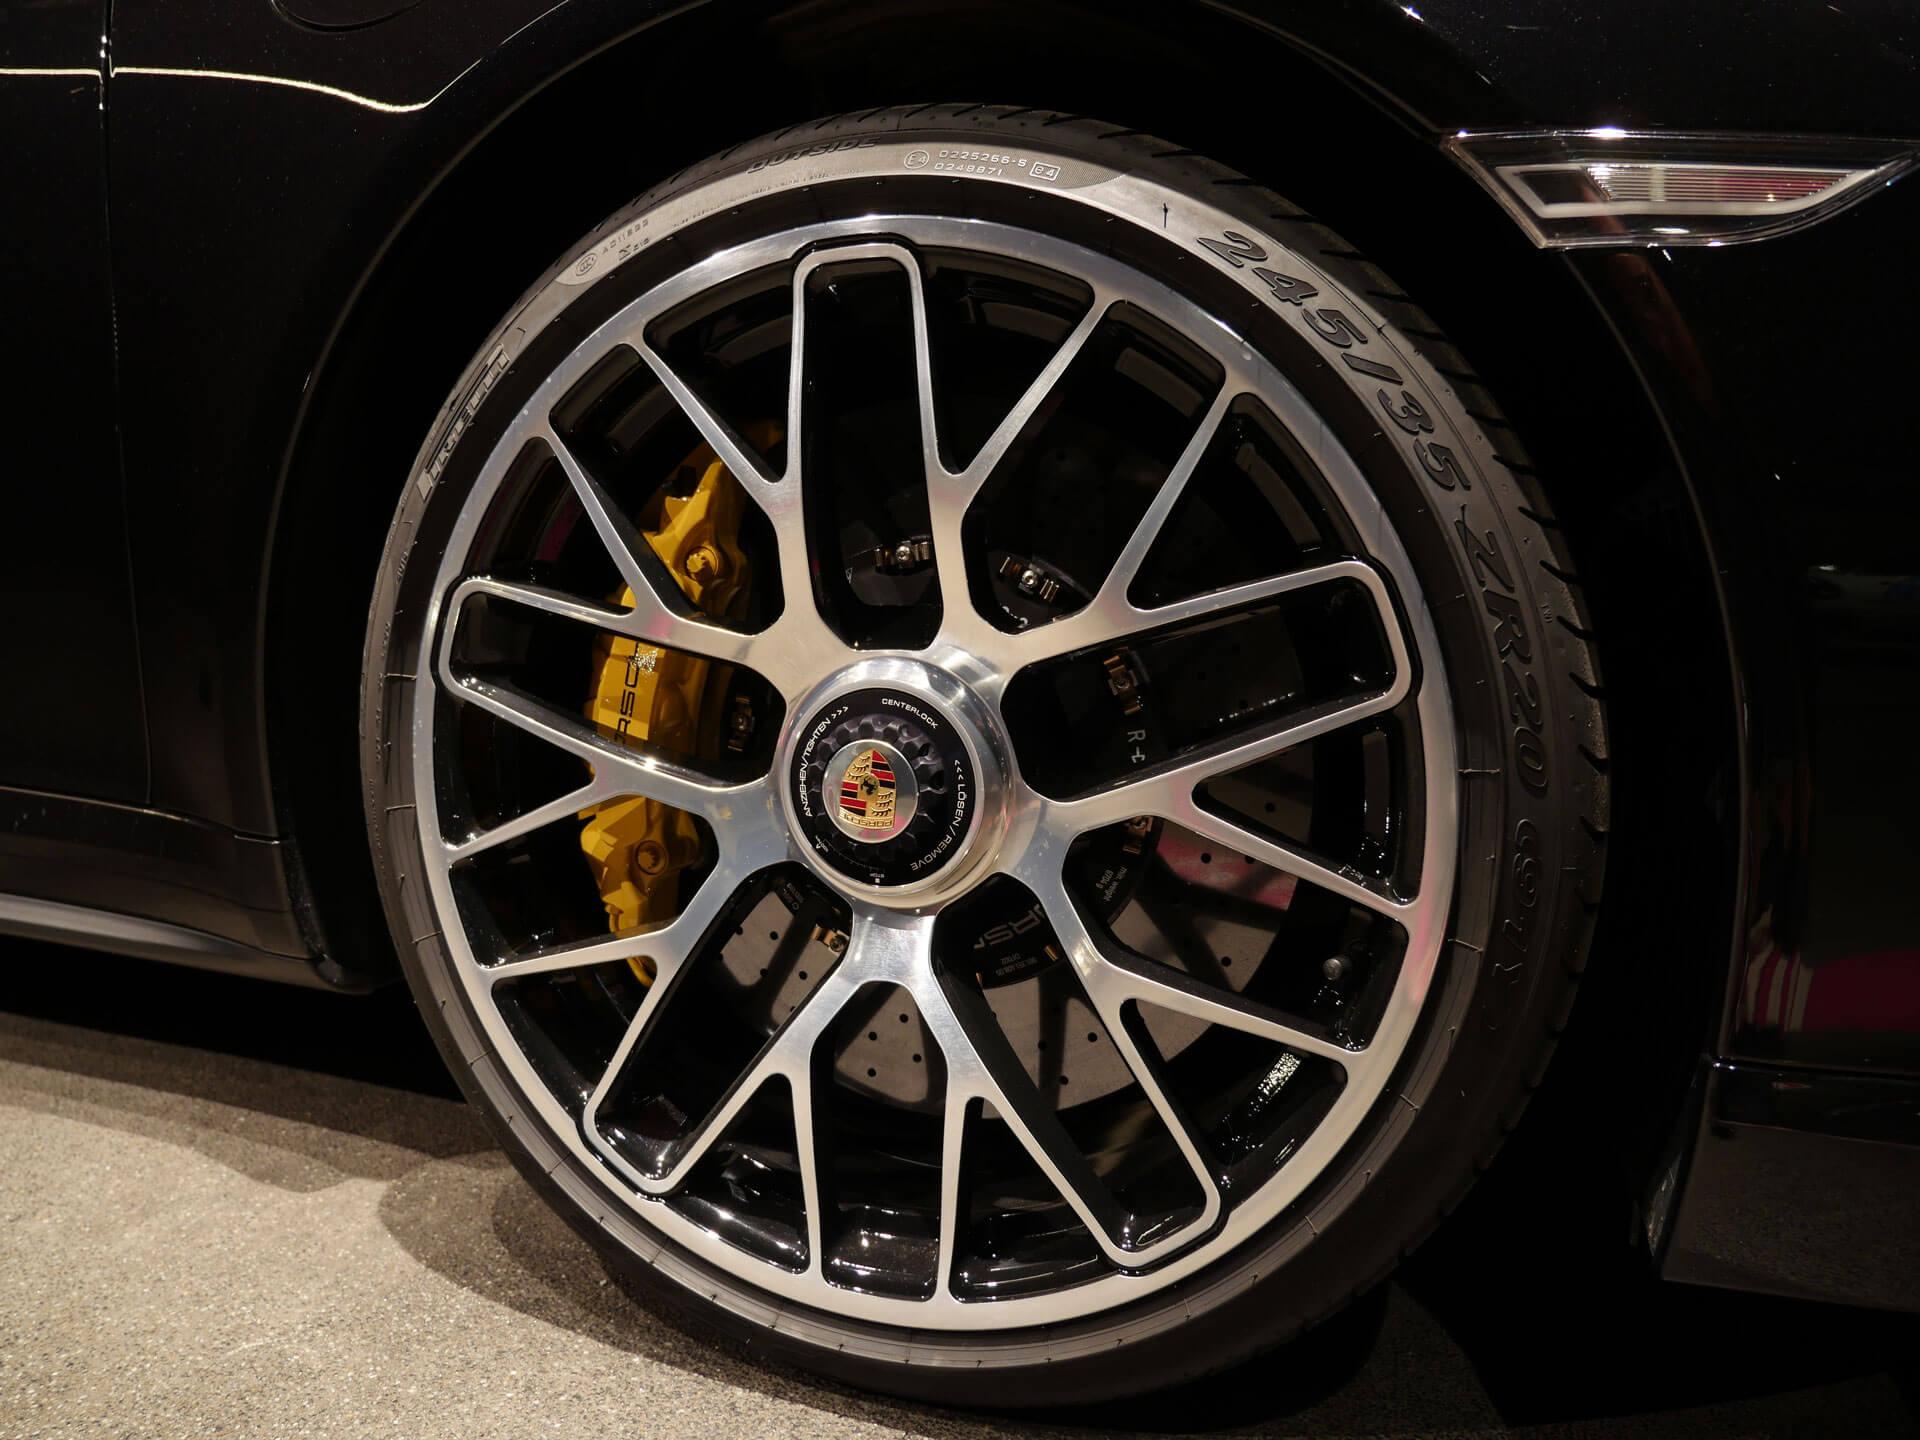 AIL Porsche 911 991 Turbo S Ceramic LED Sport Chrono Paket 10